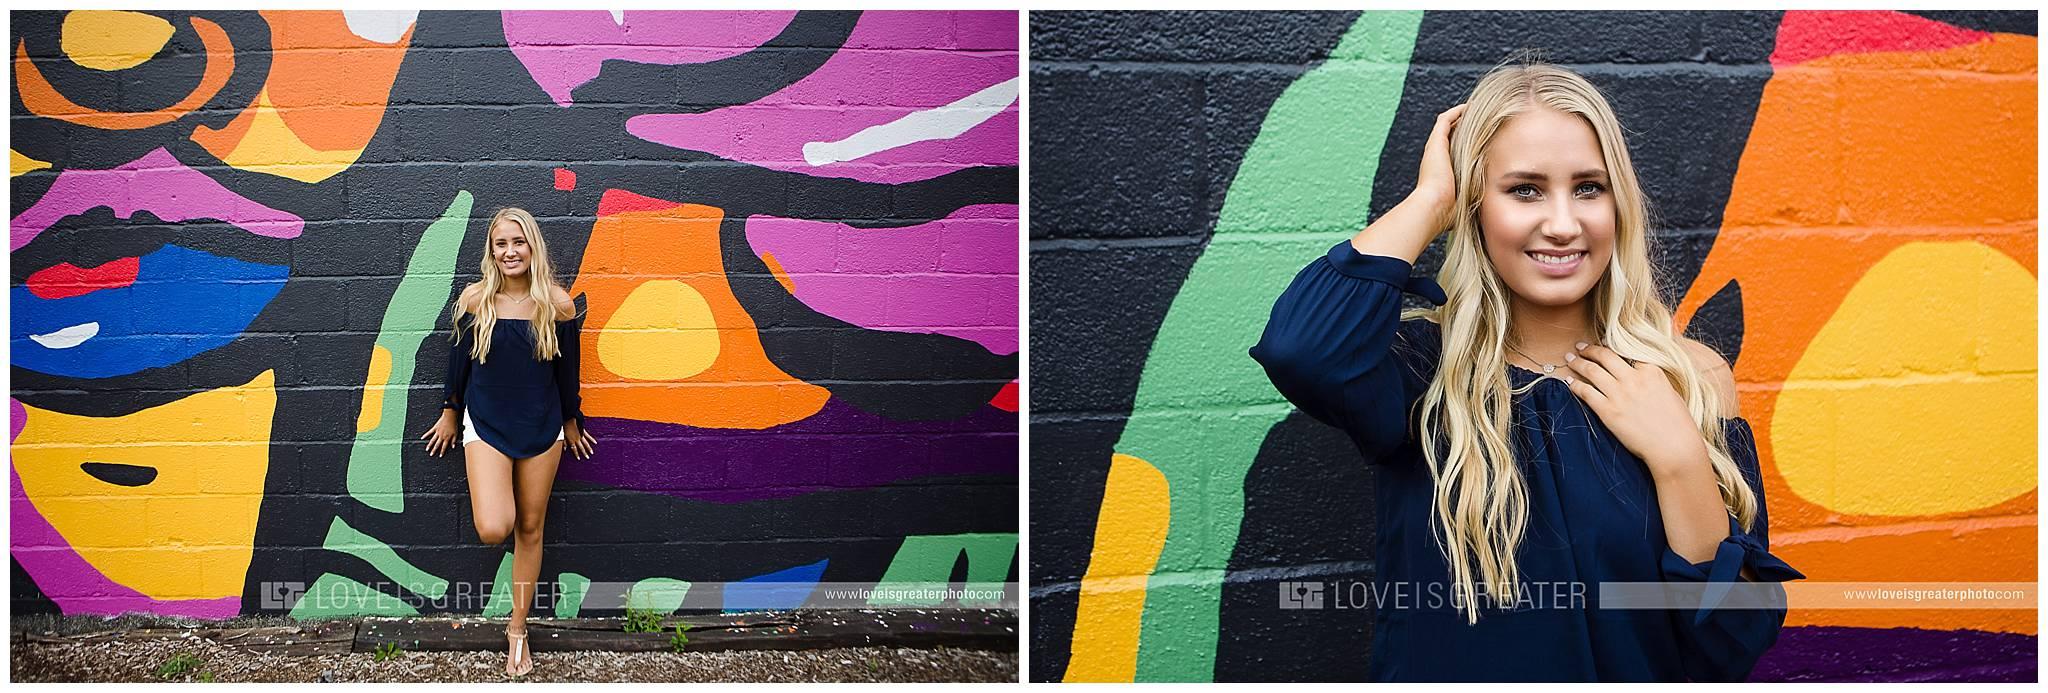 Michigan senior photographer, Michigan senior photography, Toledo Senior Photographer, toledo senior photography, toledo botanical gardens portraits, toledo senior portraits, toledo portrait photographer, toledo portrait photography, ohio senior photographer, michigan senior photographer, sylvania senior photographer, sylvania ohio senior photographer, summer senior photography, summer senior photography,